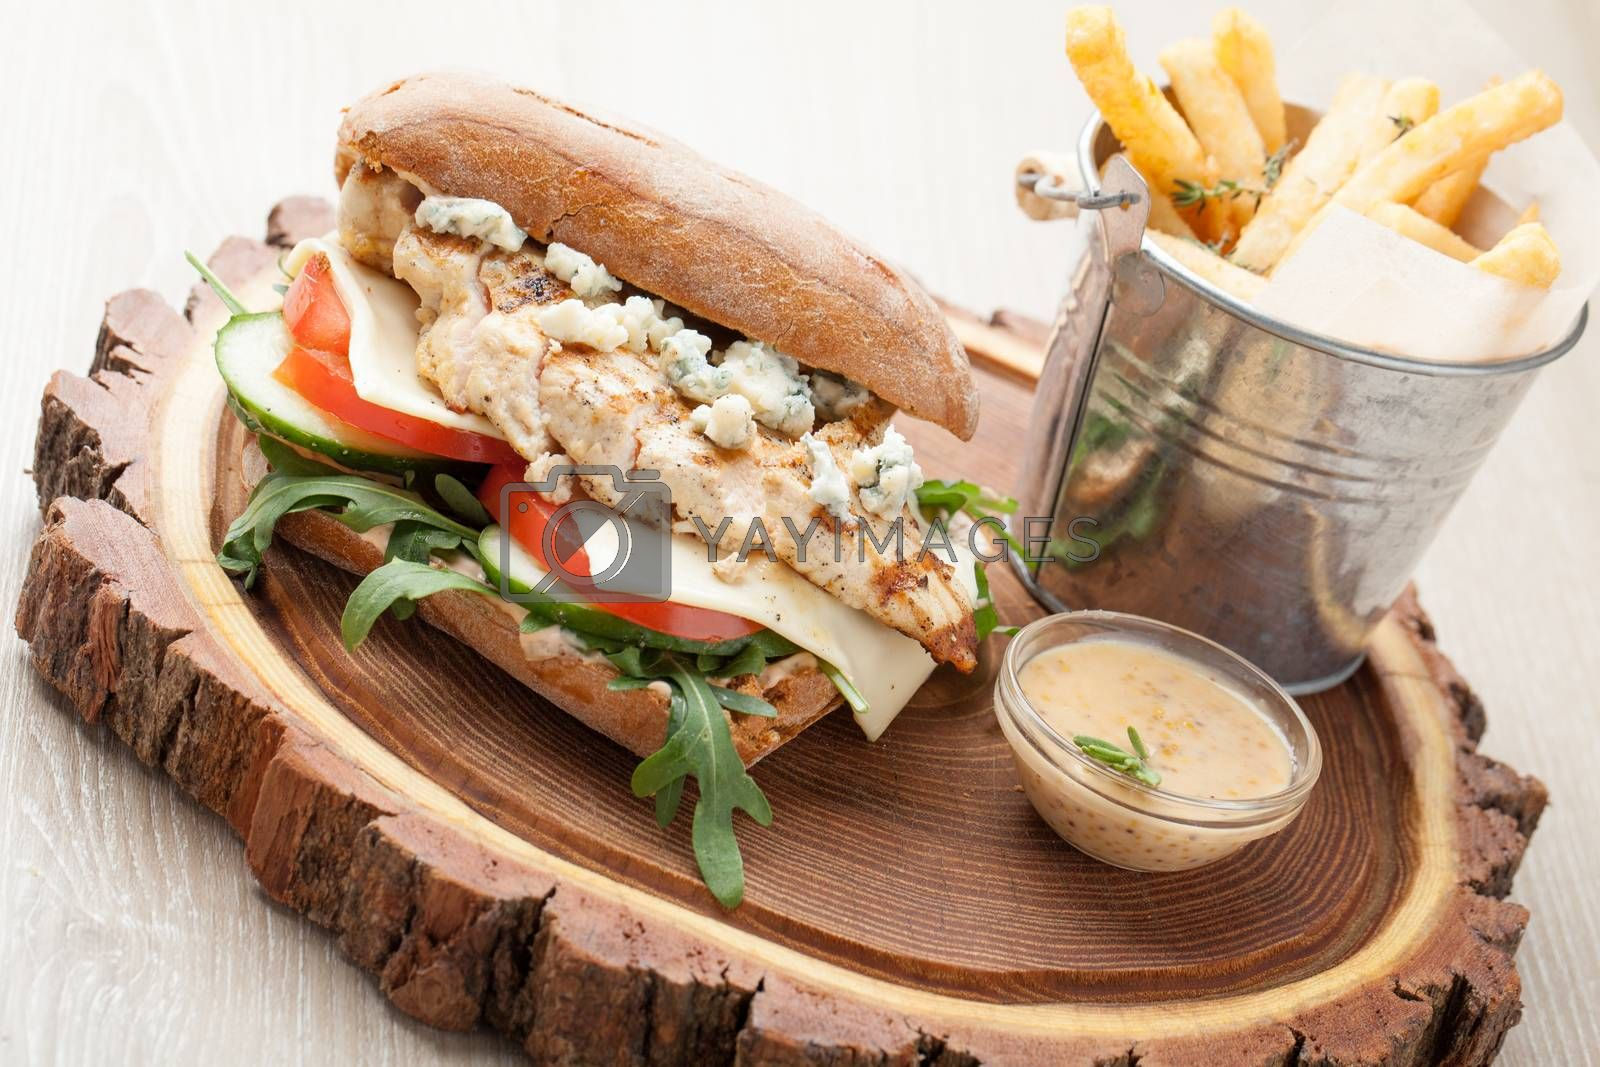 Royalty free image of Wheat chicken sandwich burger, fried potatoes, mustard sauce. Se by SergeyAK